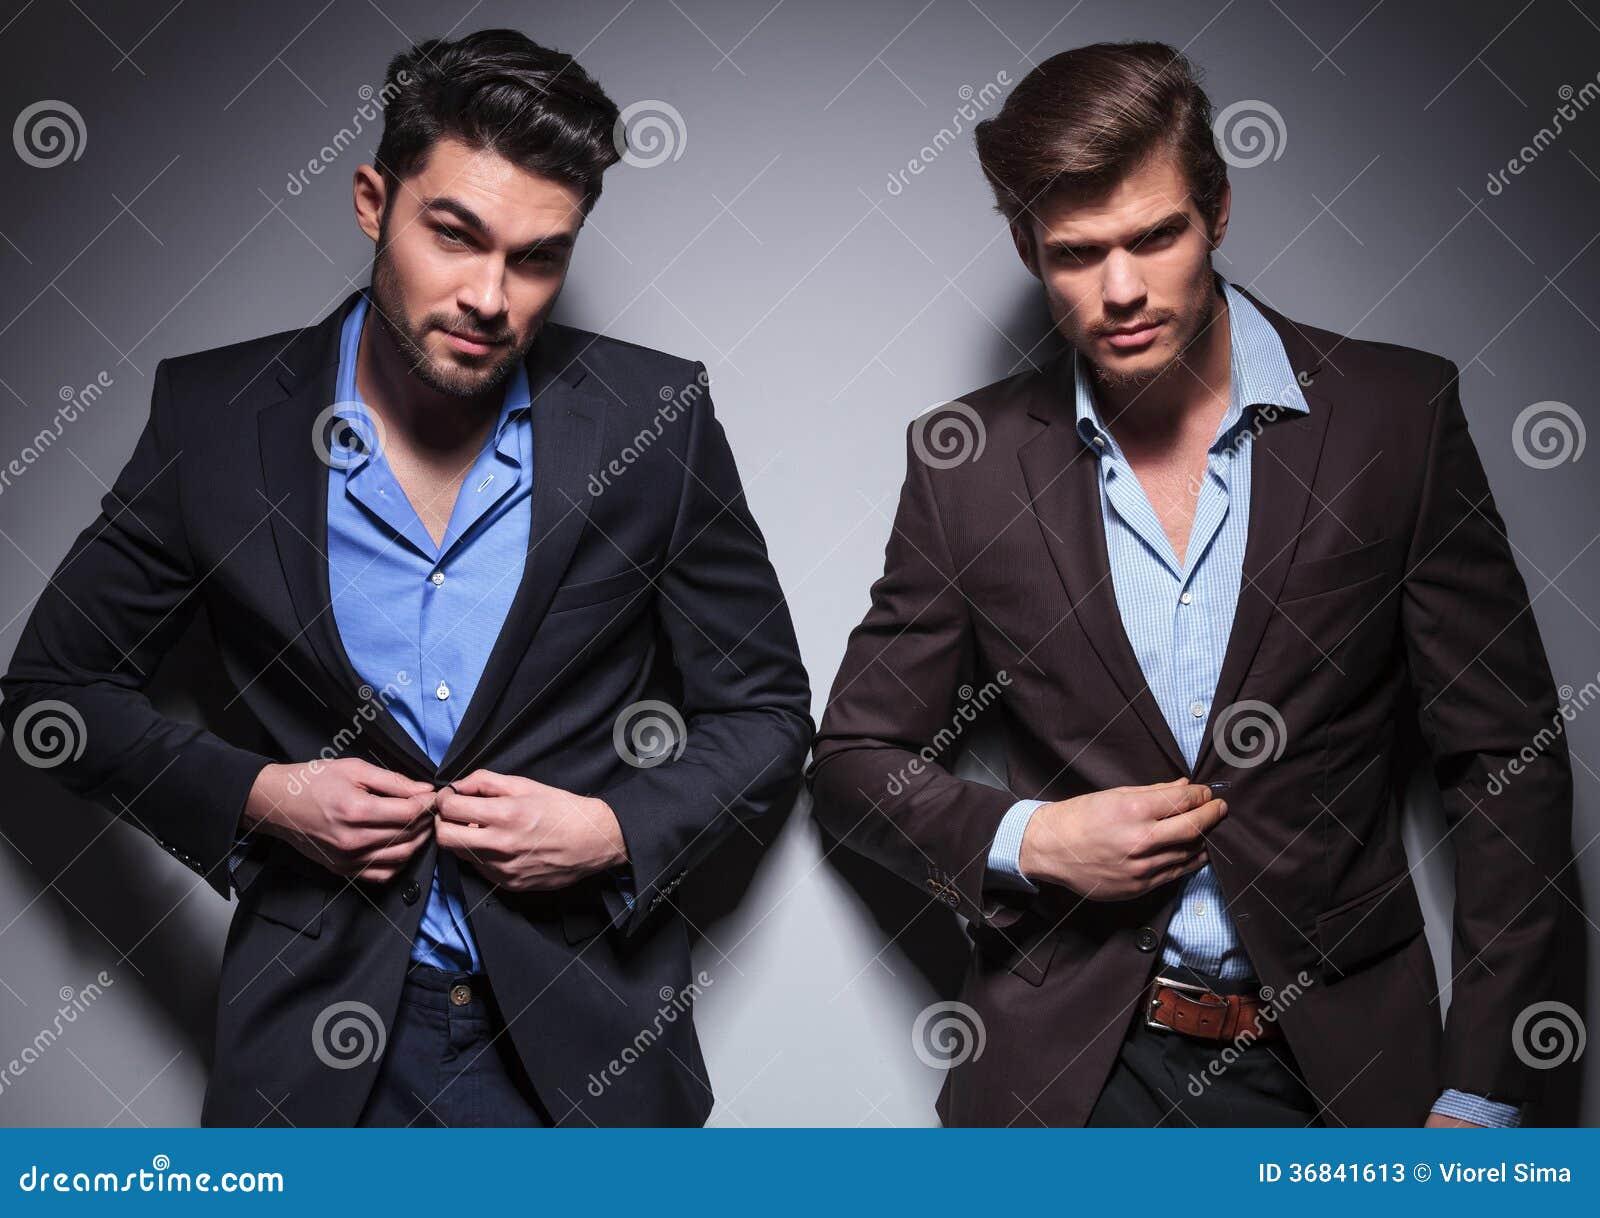 Smiling fashion men buttoning their coats